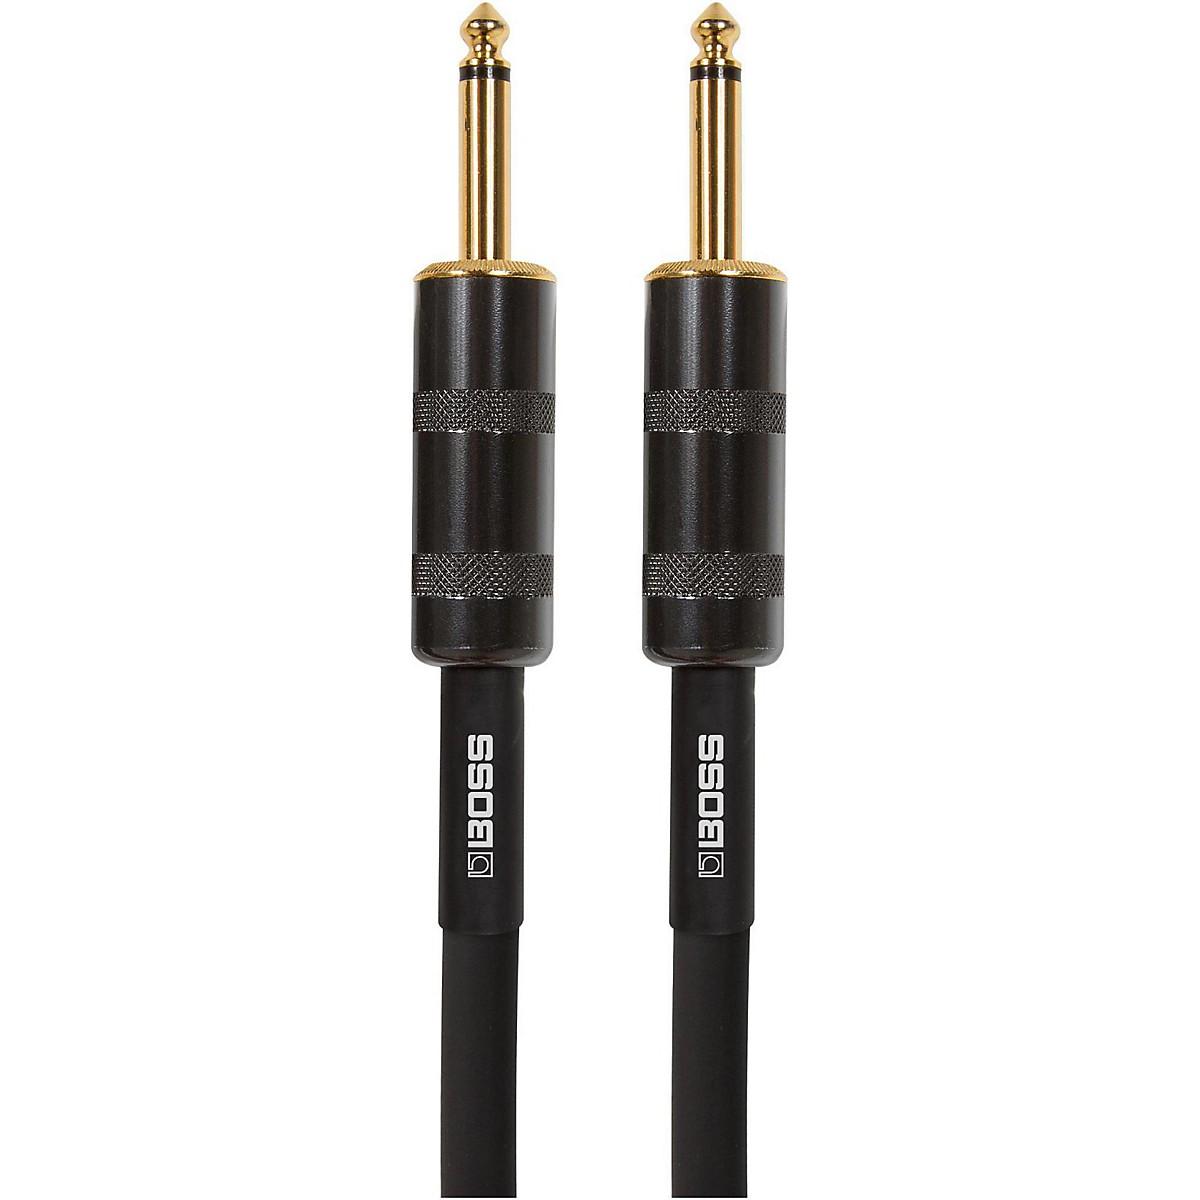 Boss 14-Gauge Speaker Cable